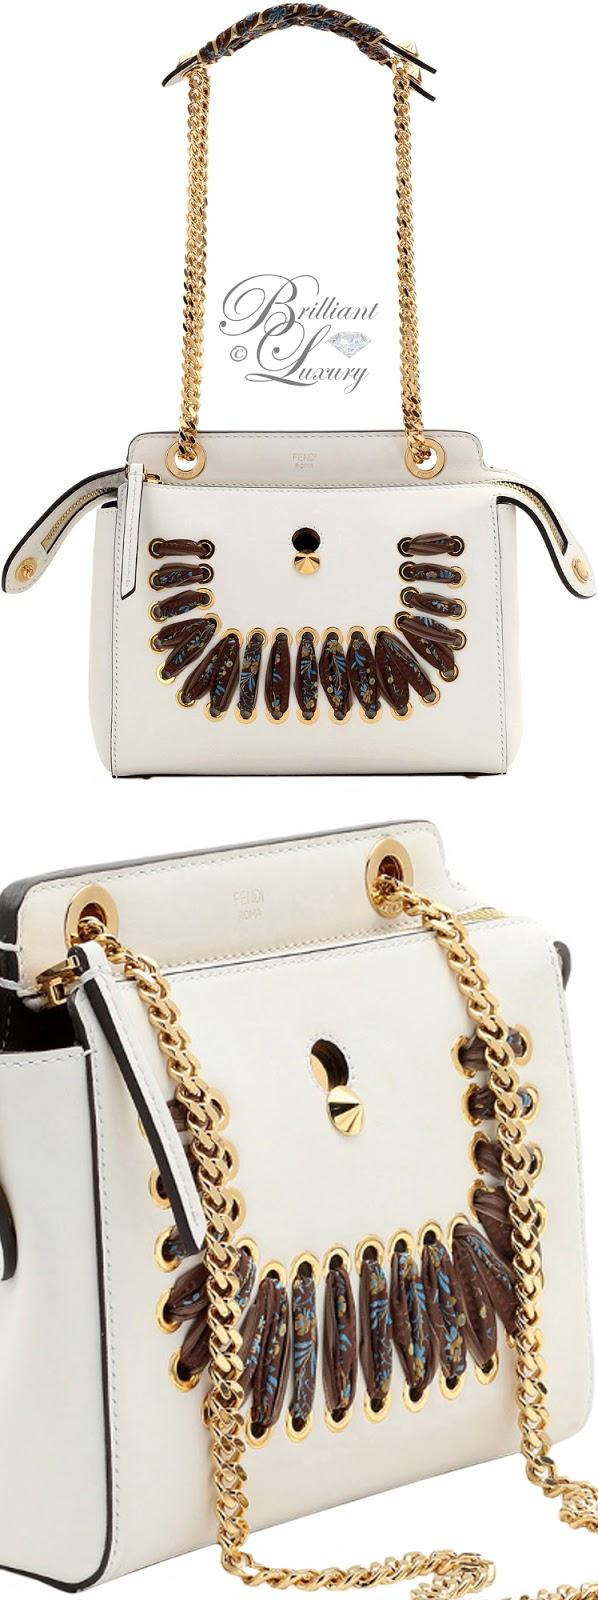 Brilliant Luxury ♦ Fendi Dotcom Ribbon-Laced Shoulder Bag #white